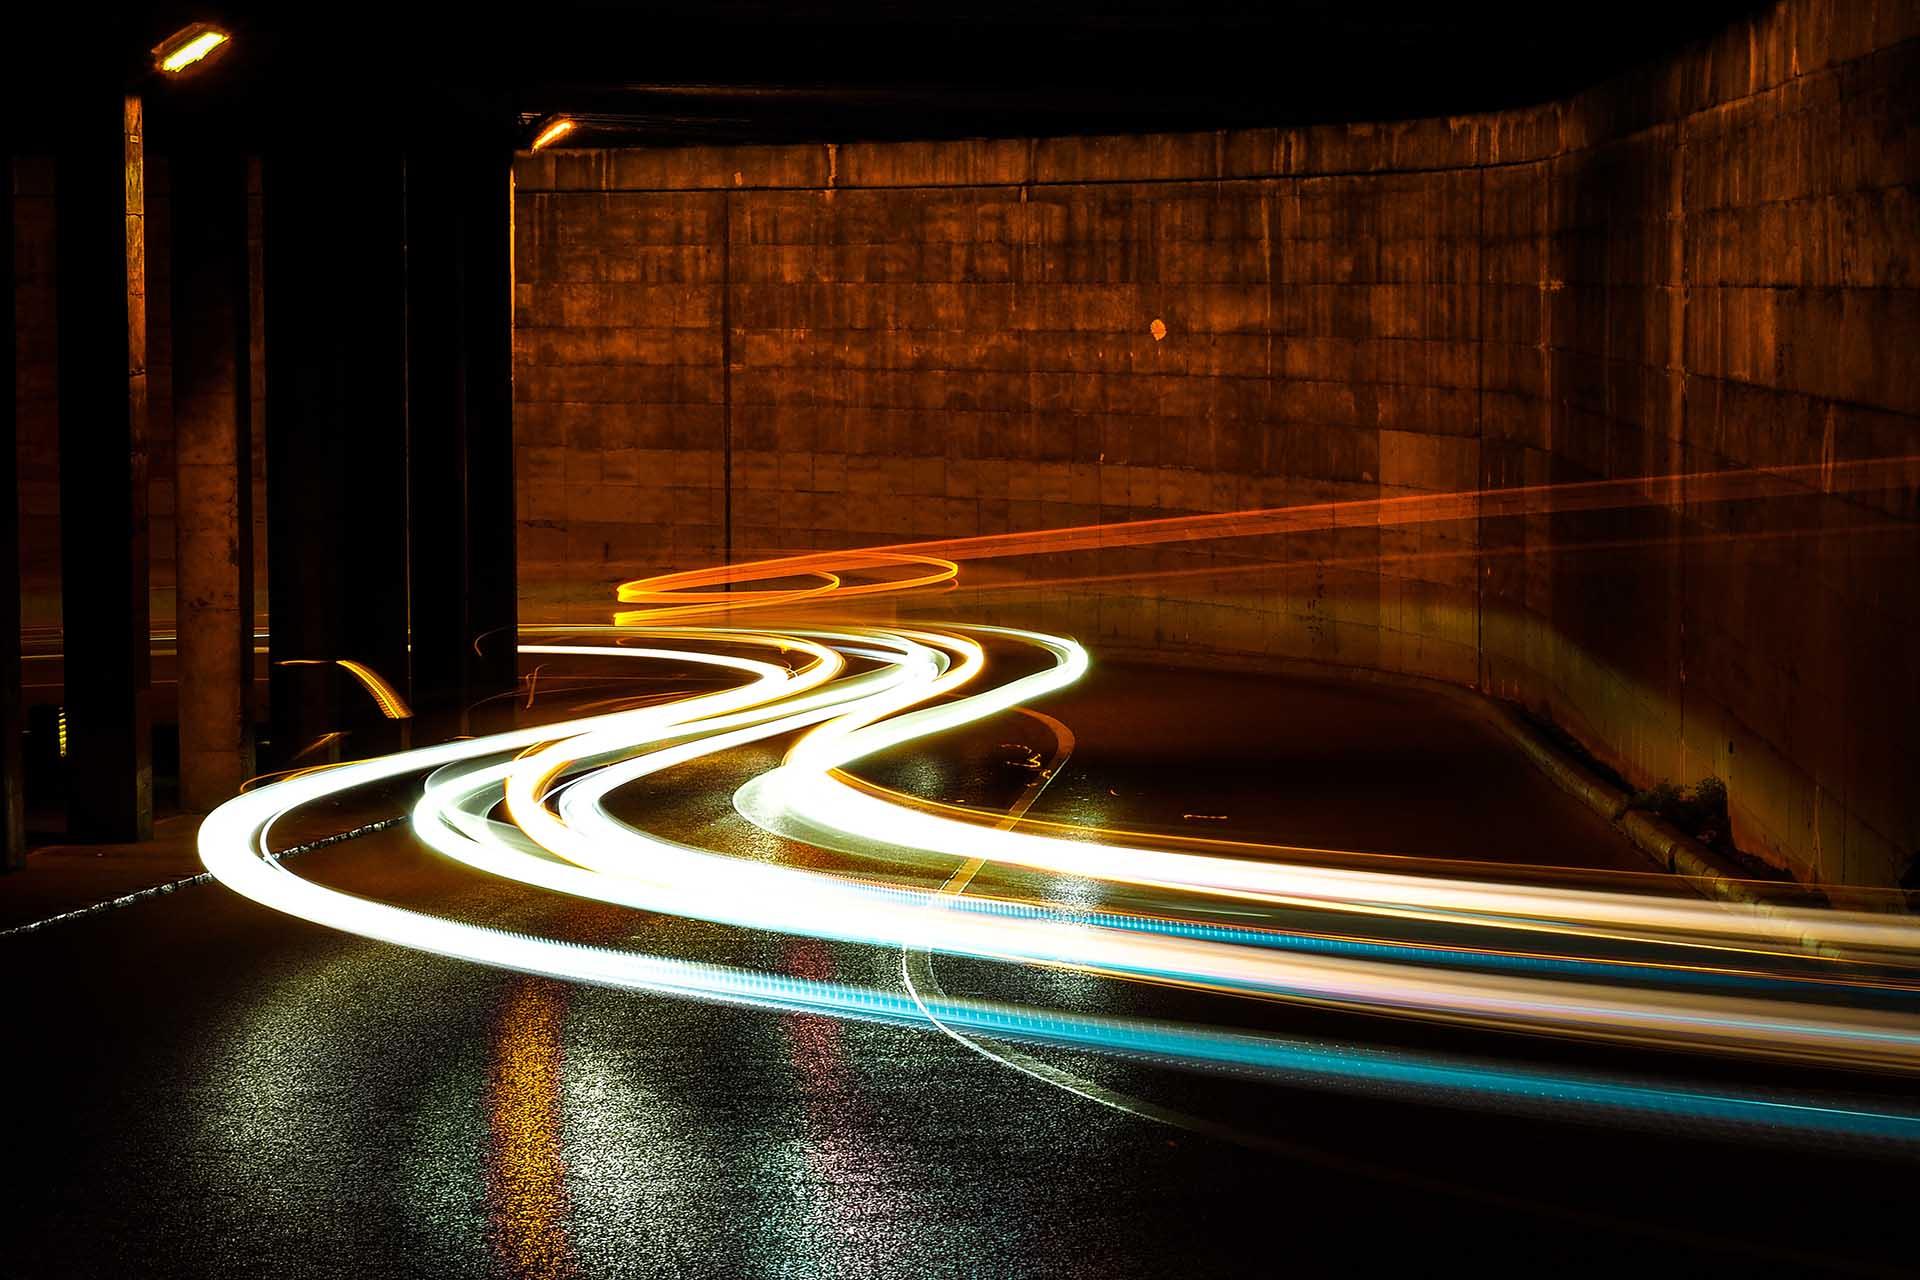 t2informatik Blog: The agile speed lie